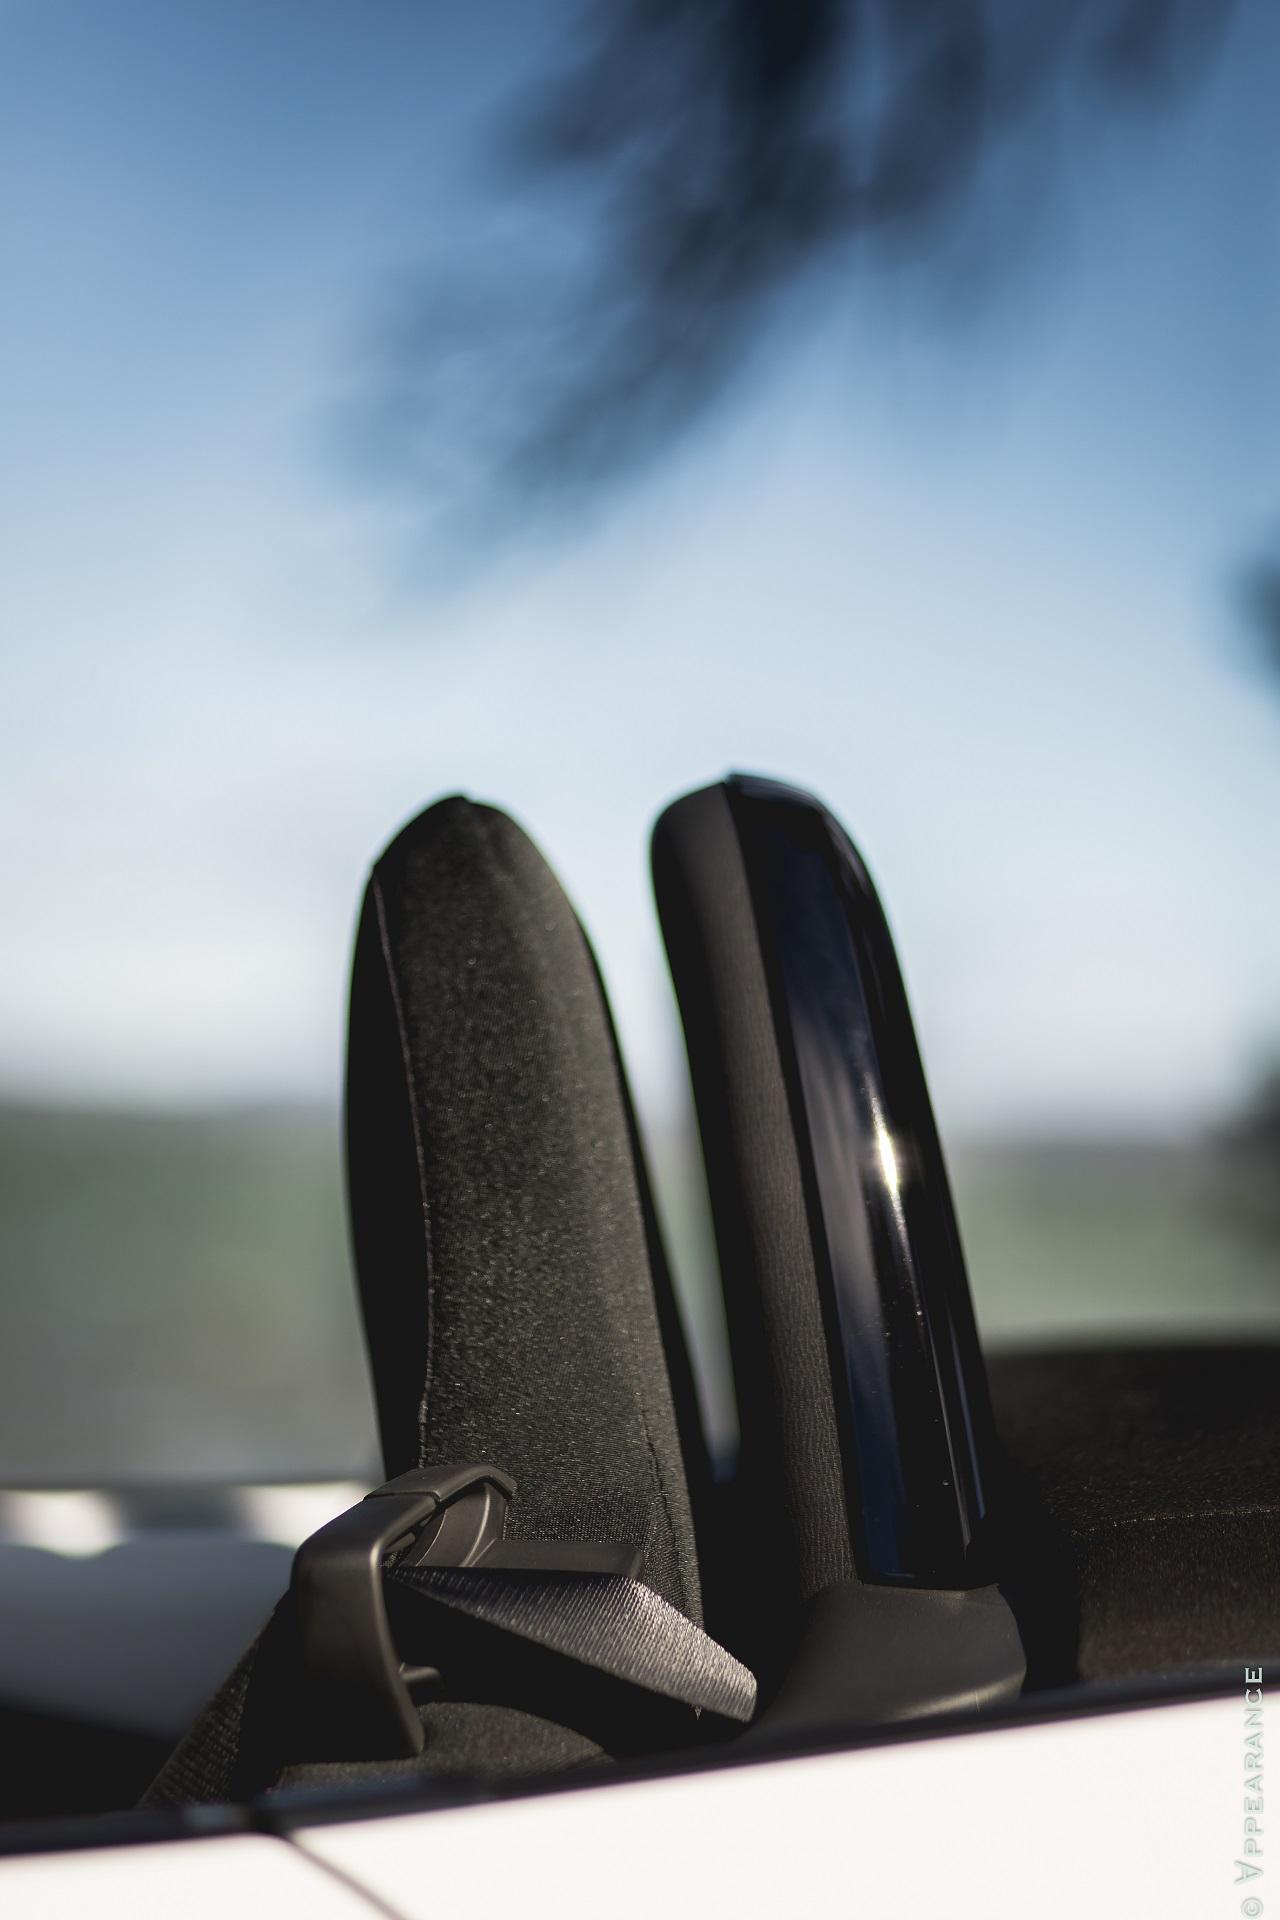 2016 Mazda MX-5 Seats